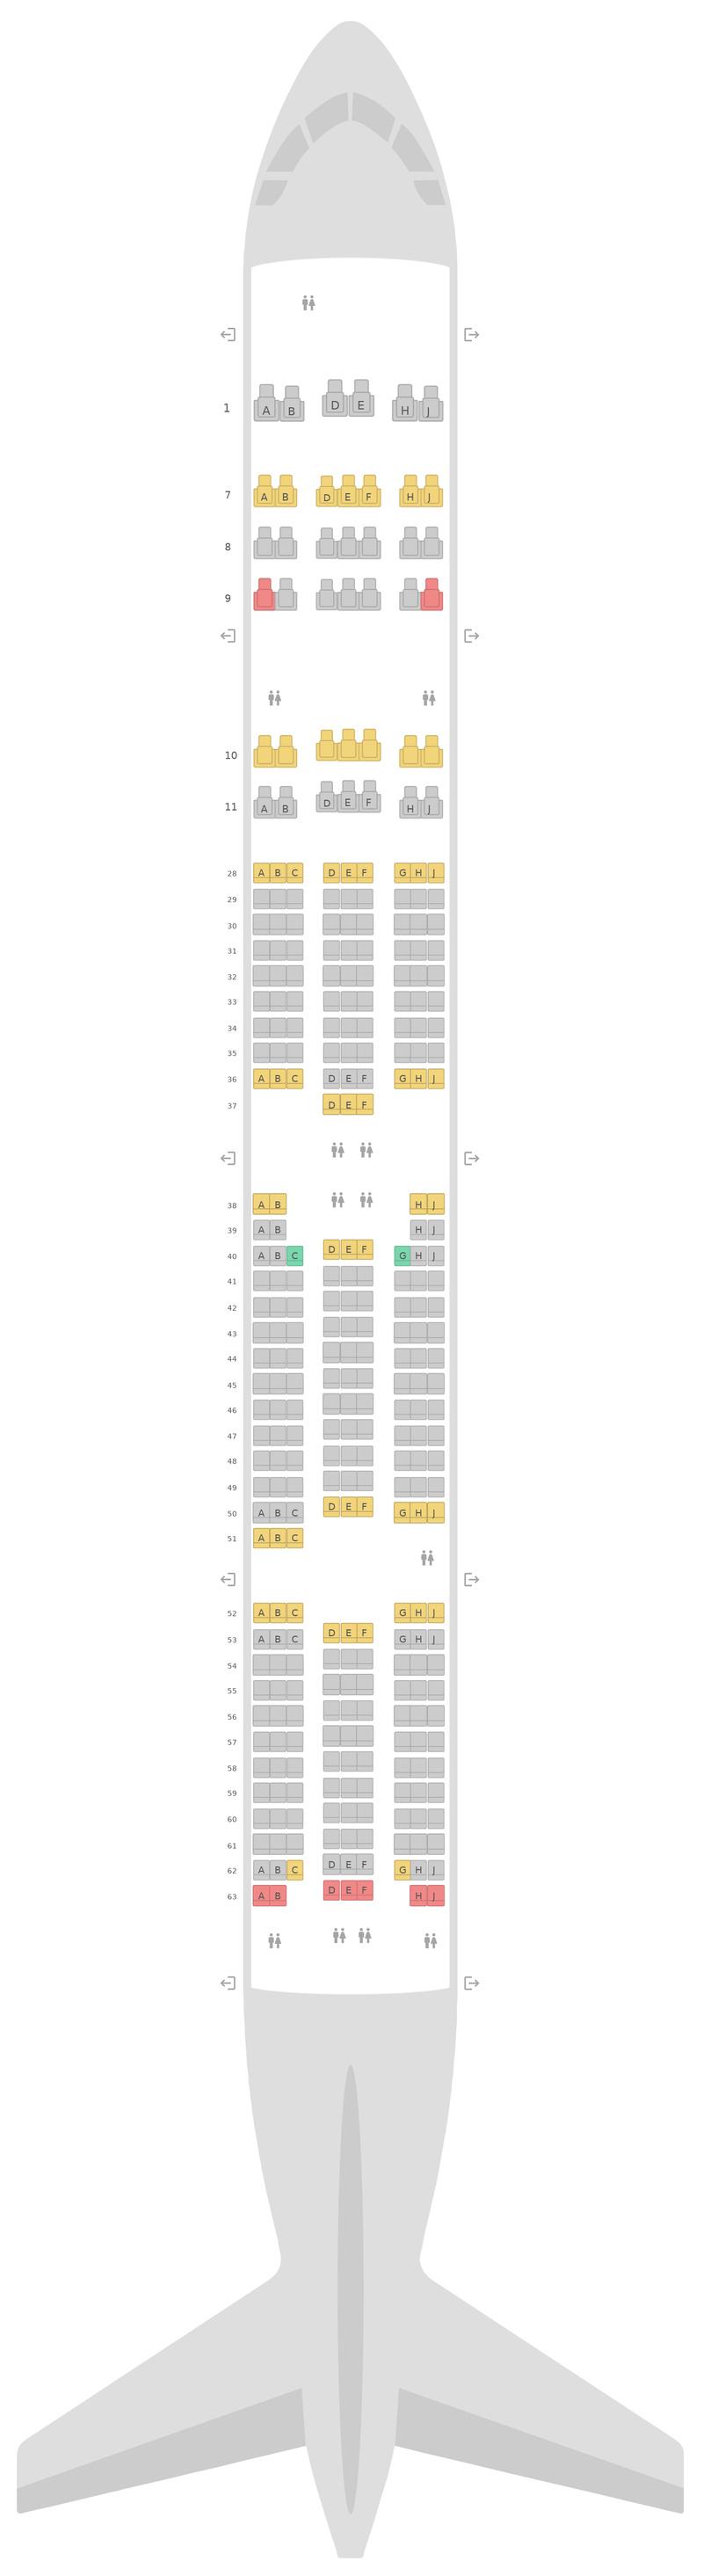 Mapa de asientos Boeing 777-300 (773) Korean Air